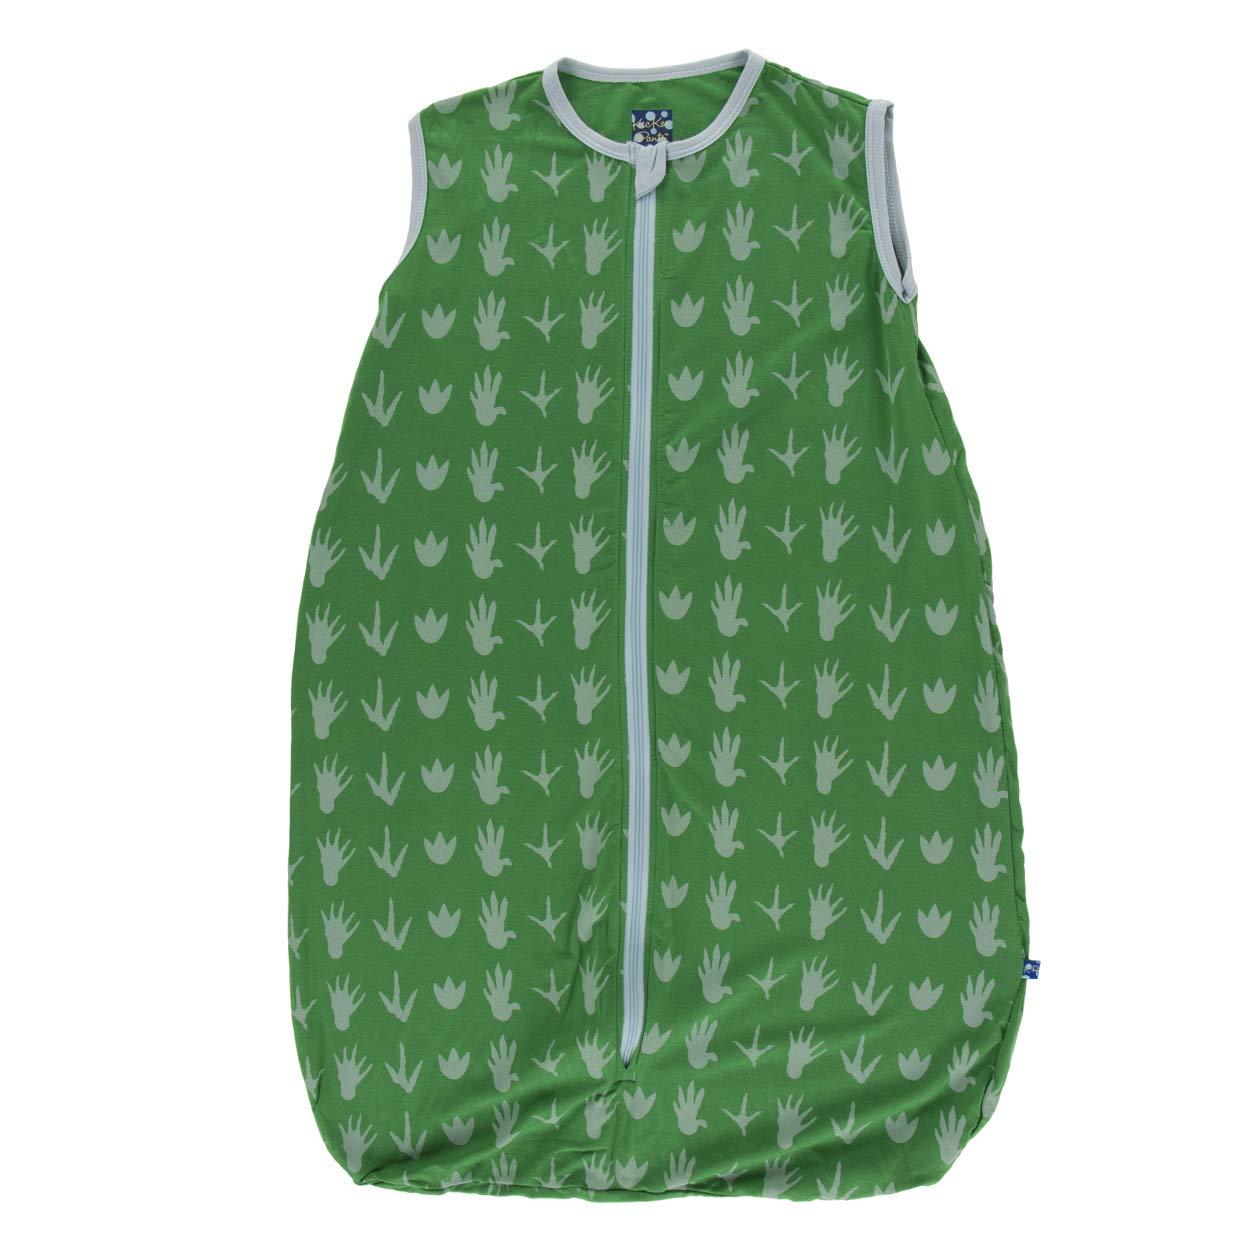 KicKee Pants Print Lightweight Sleeping Bag (0-6 Months, Dino Tracks) by Kic Kee Pants